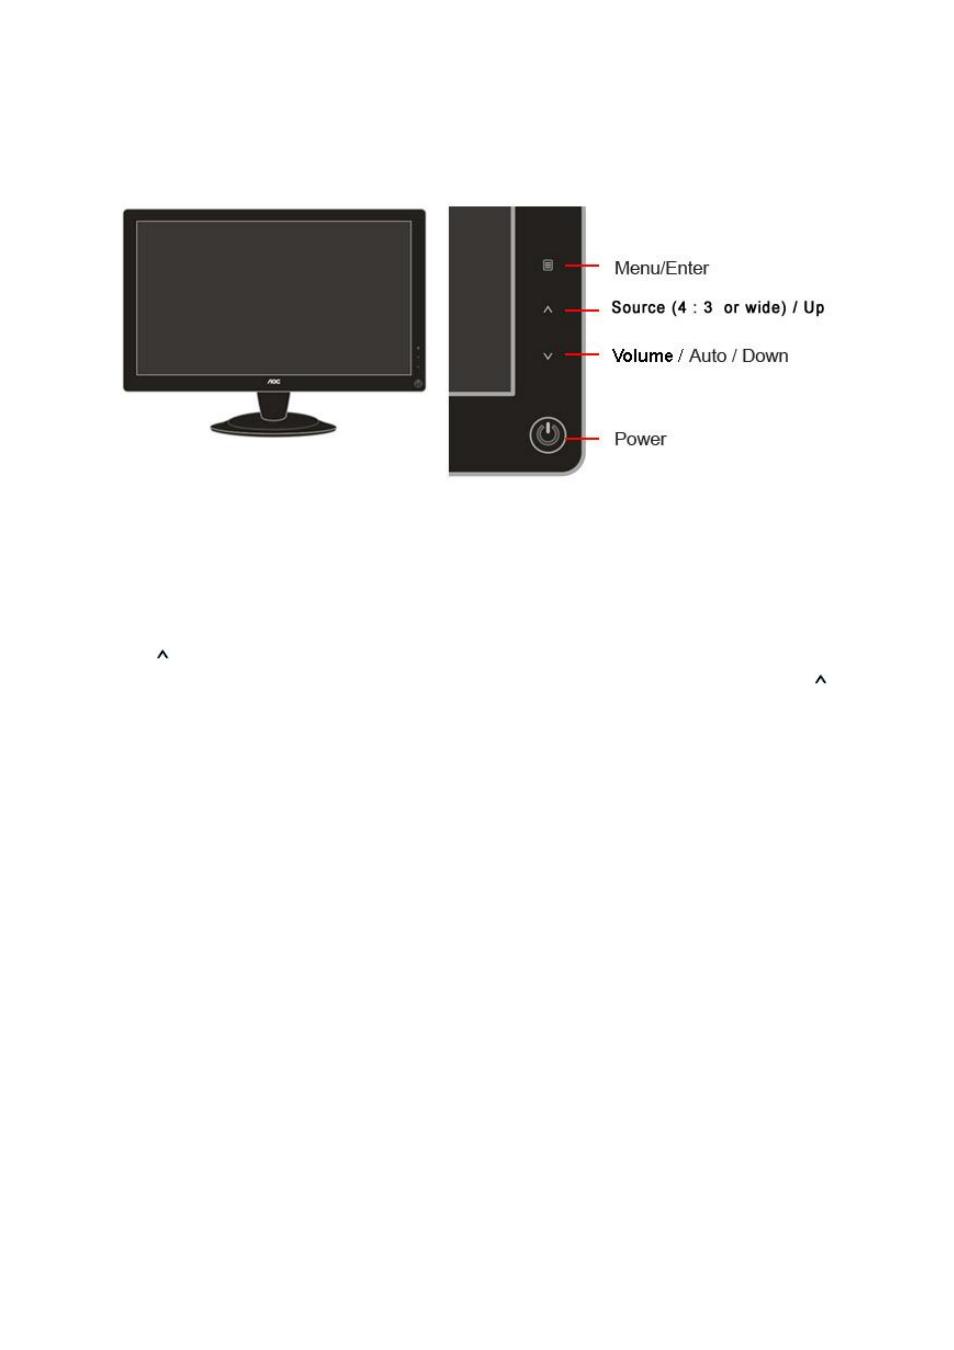 hotkeys aoc 2436vh user manual page 19 61 rh manualsdir com User Manual Template Owner's Manual